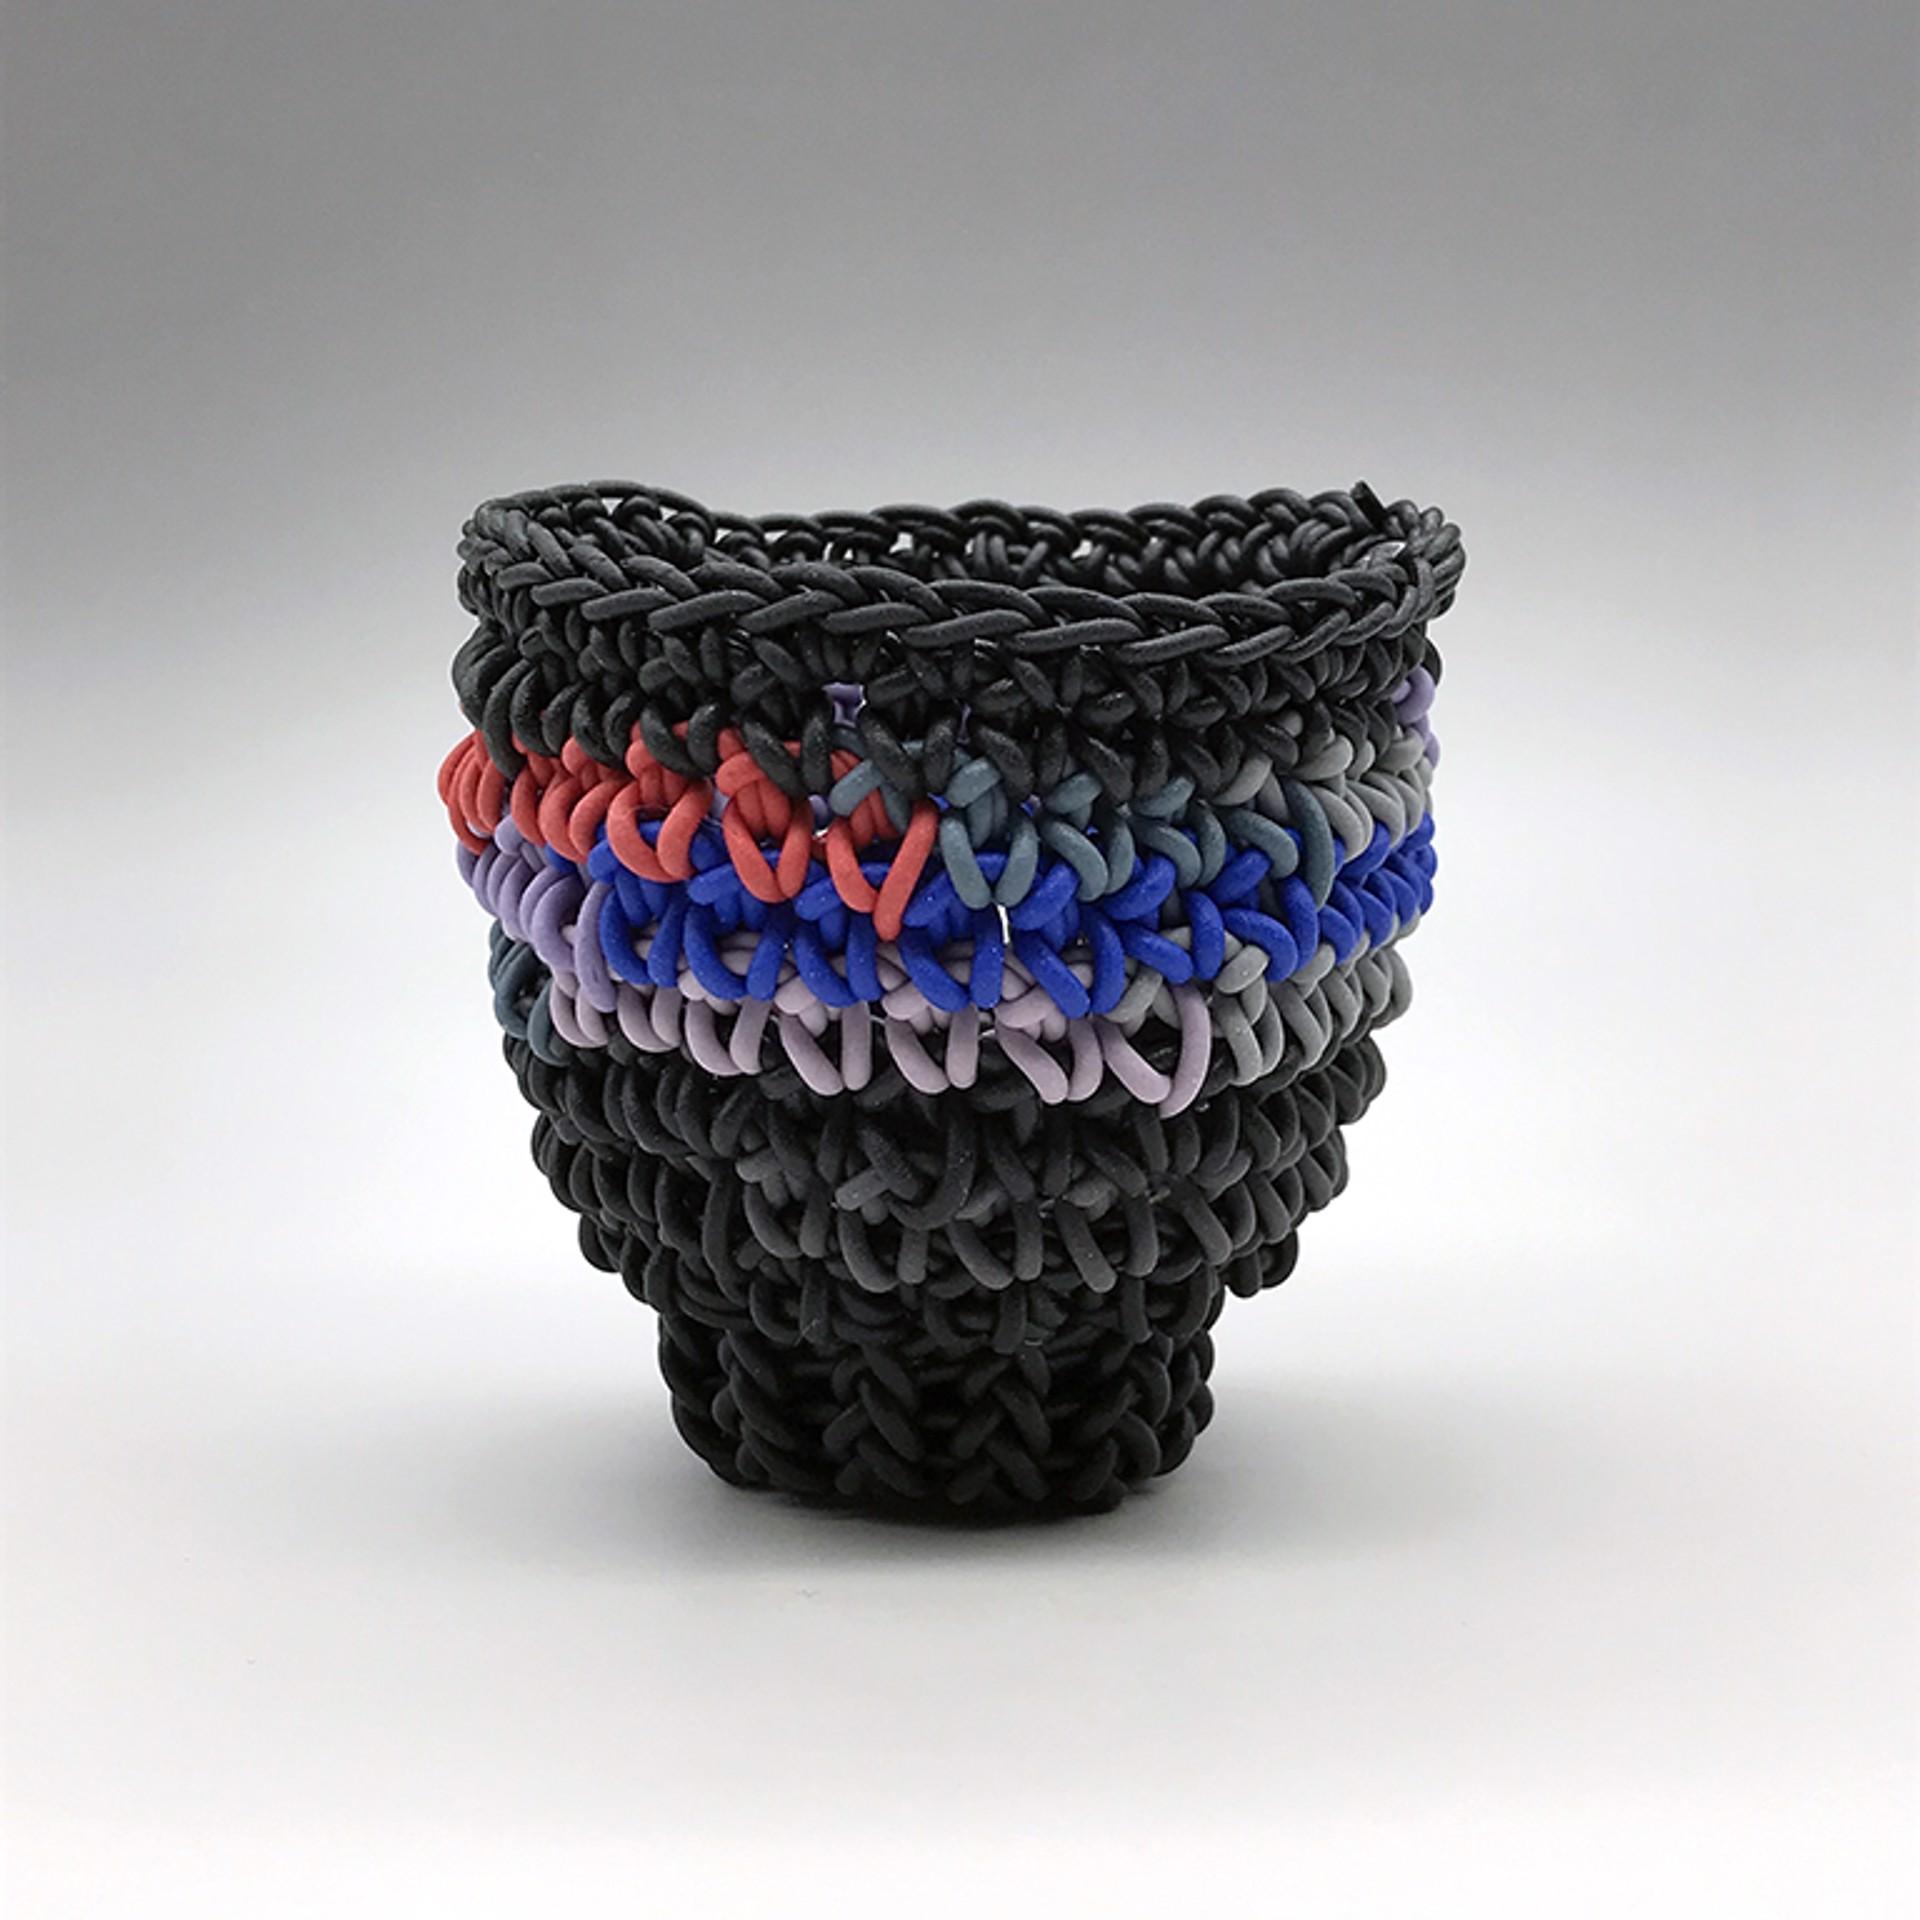 Tea Bowl (Black w/Blue, Denim, Red & Lavender Rows) by Jeremy Brooks